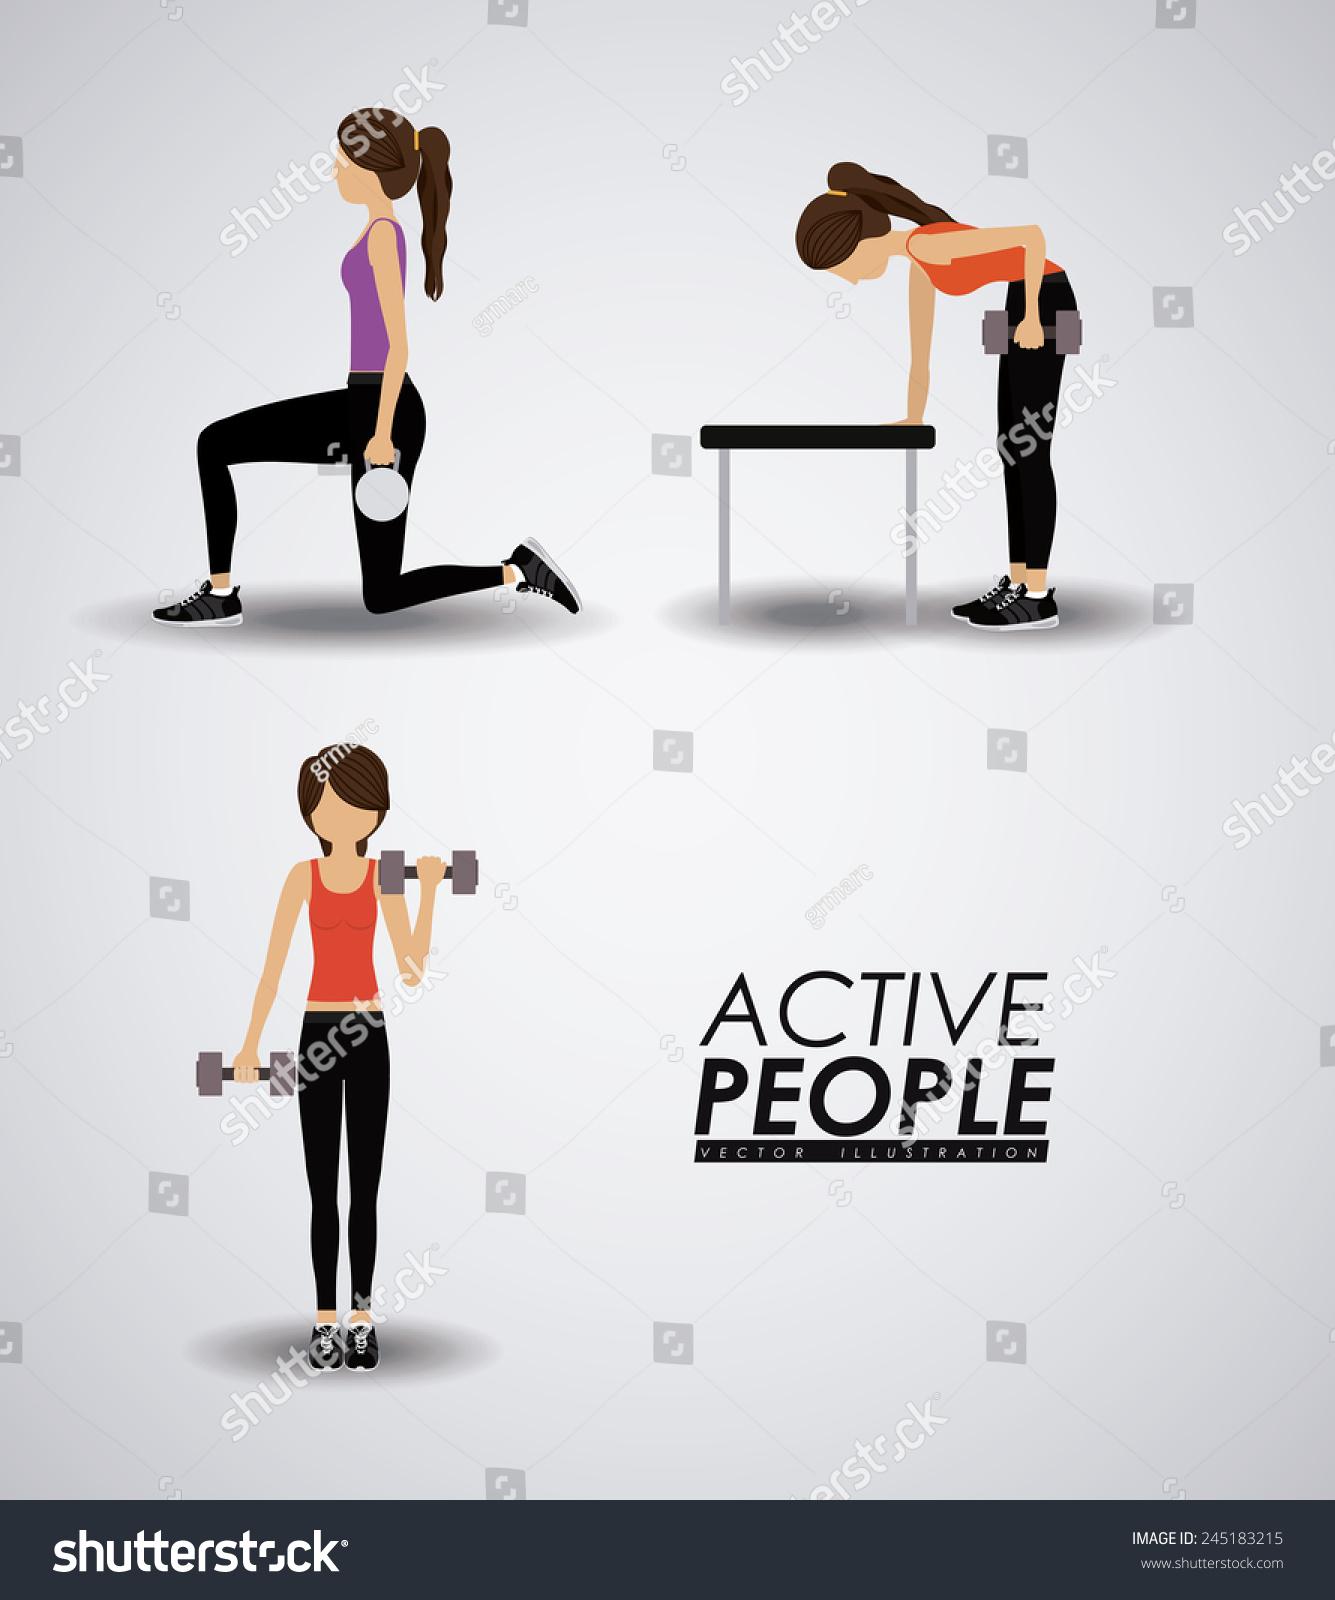 Fitness Design Over Gray Background Vector Stock Vector 245183215 ... for Physical Fitness Design  56bof